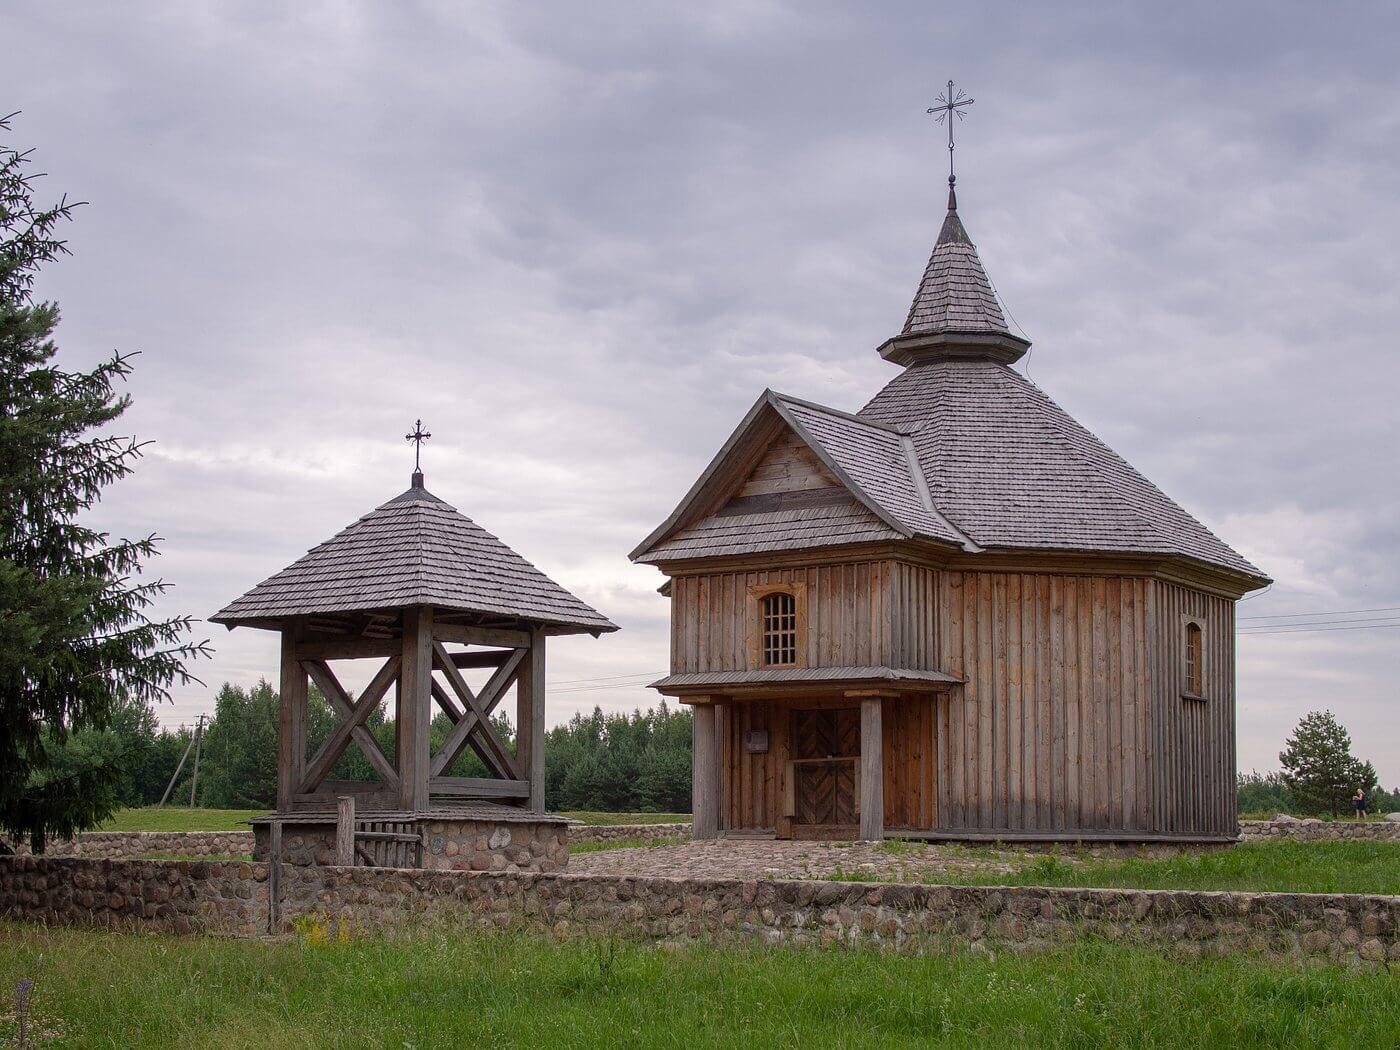 Strochitsy Rural Life outdoor museum in Belarus, wooden houses